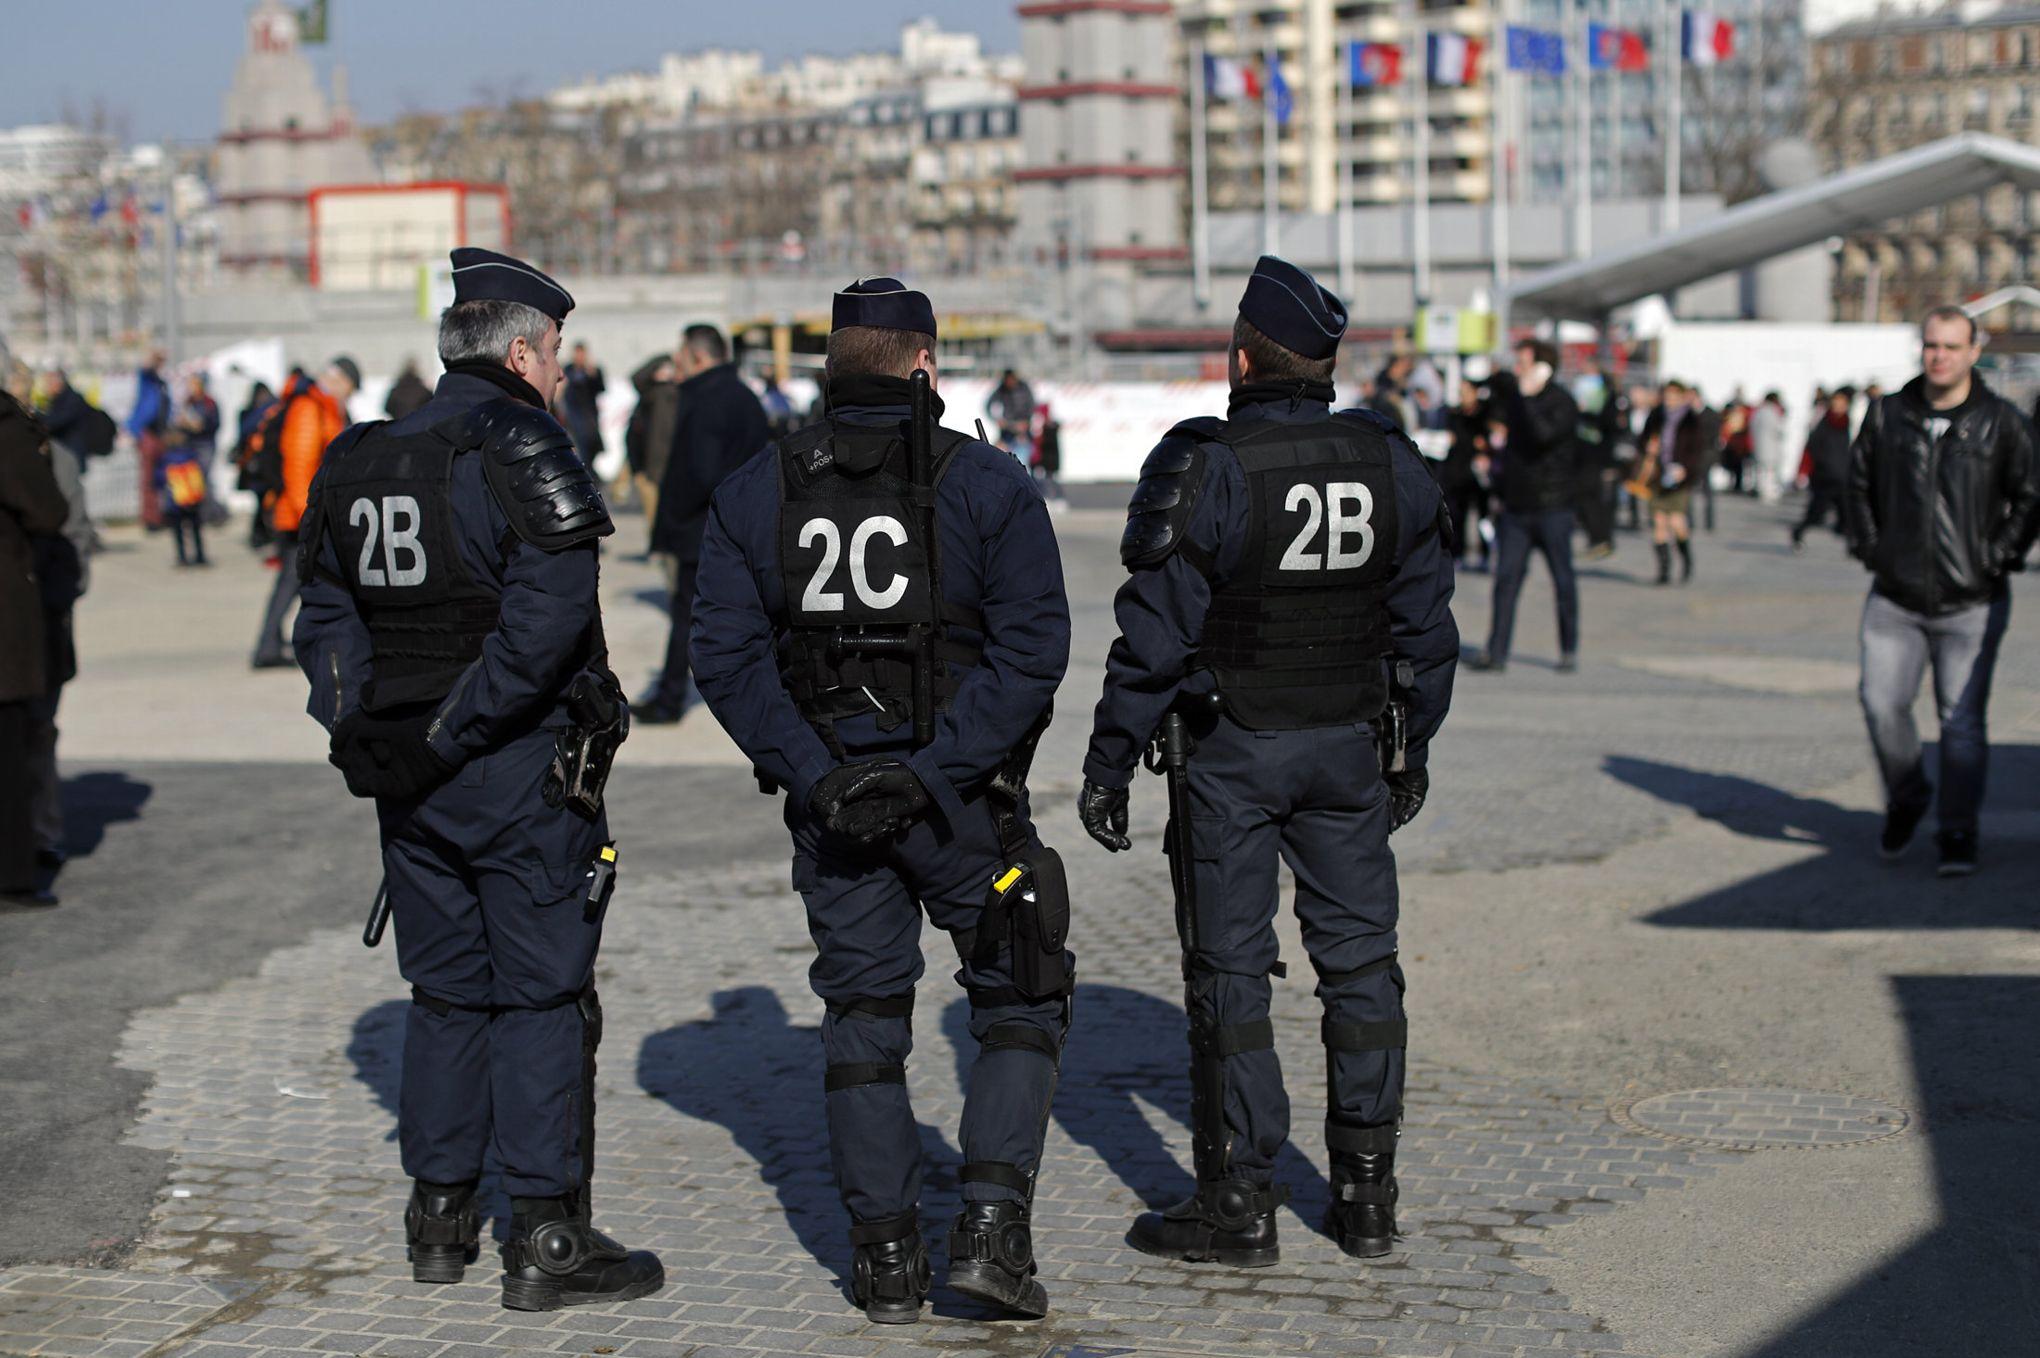 la pr fecture de police de paris met en garde contre les rumeurs d 39 attentats. Black Bedroom Furniture Sets. Home Design Ideas